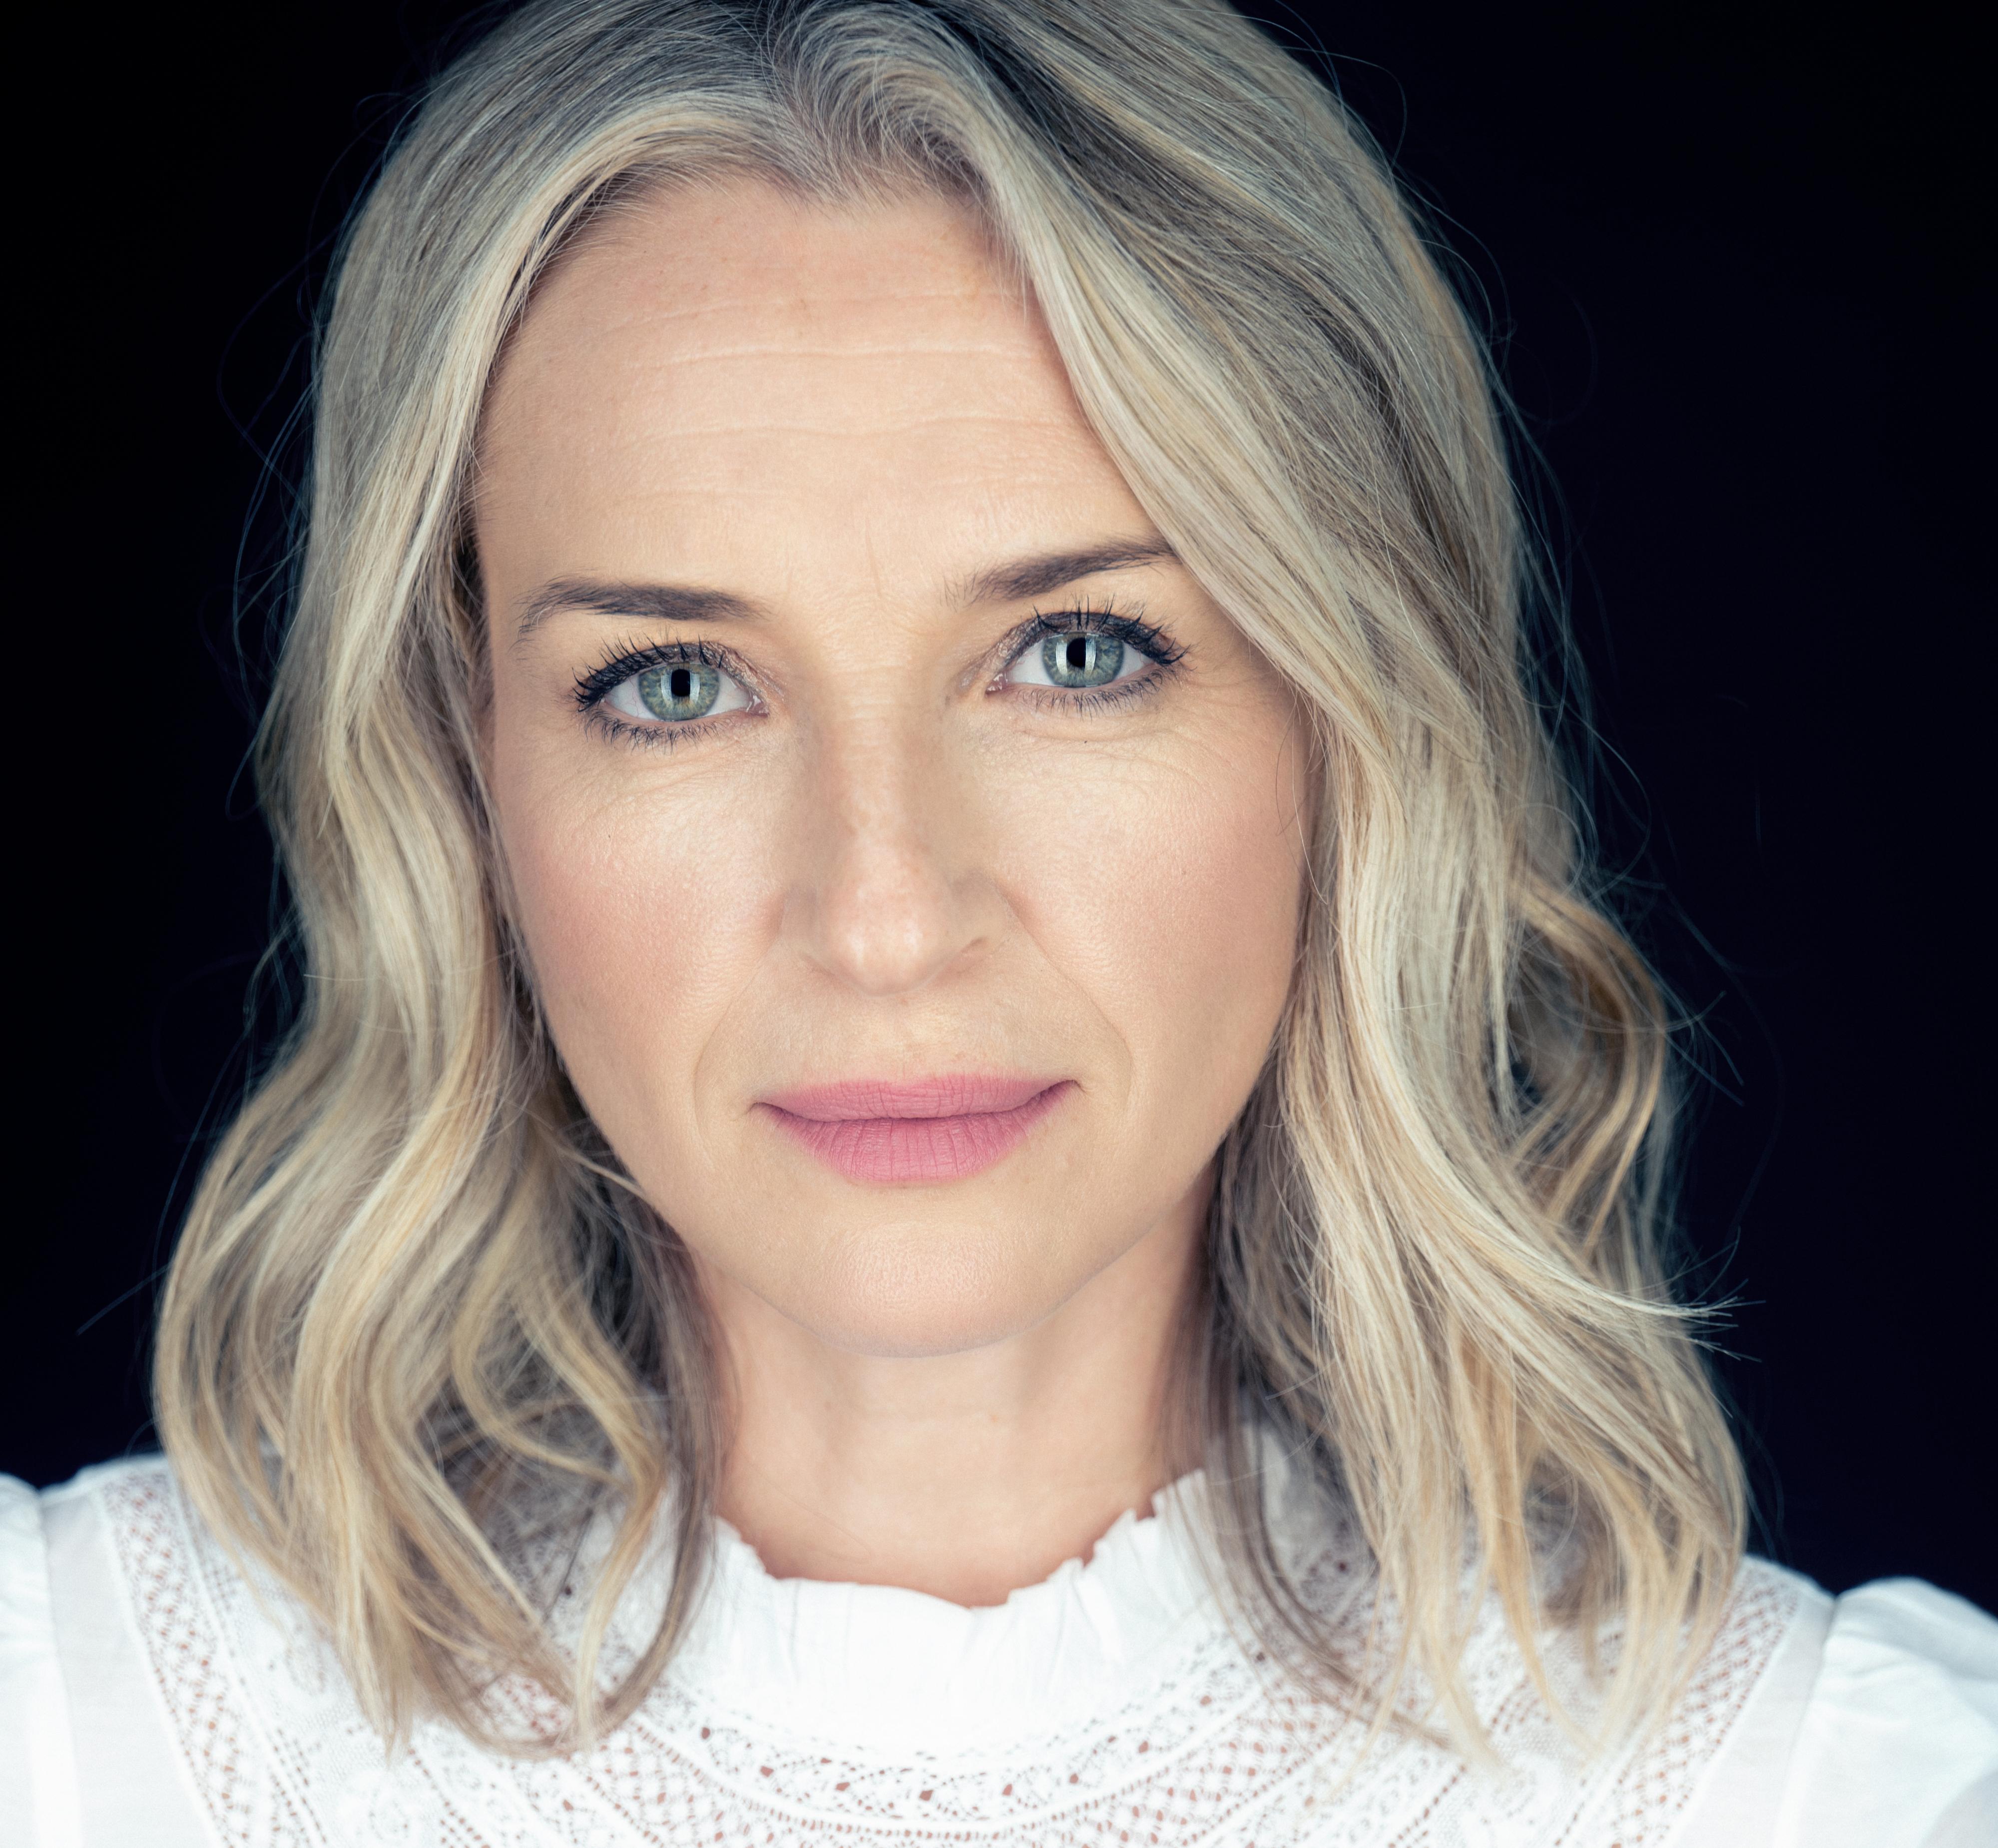 Ever Carradine: Ever So Talented Actress - Millennium Magazine